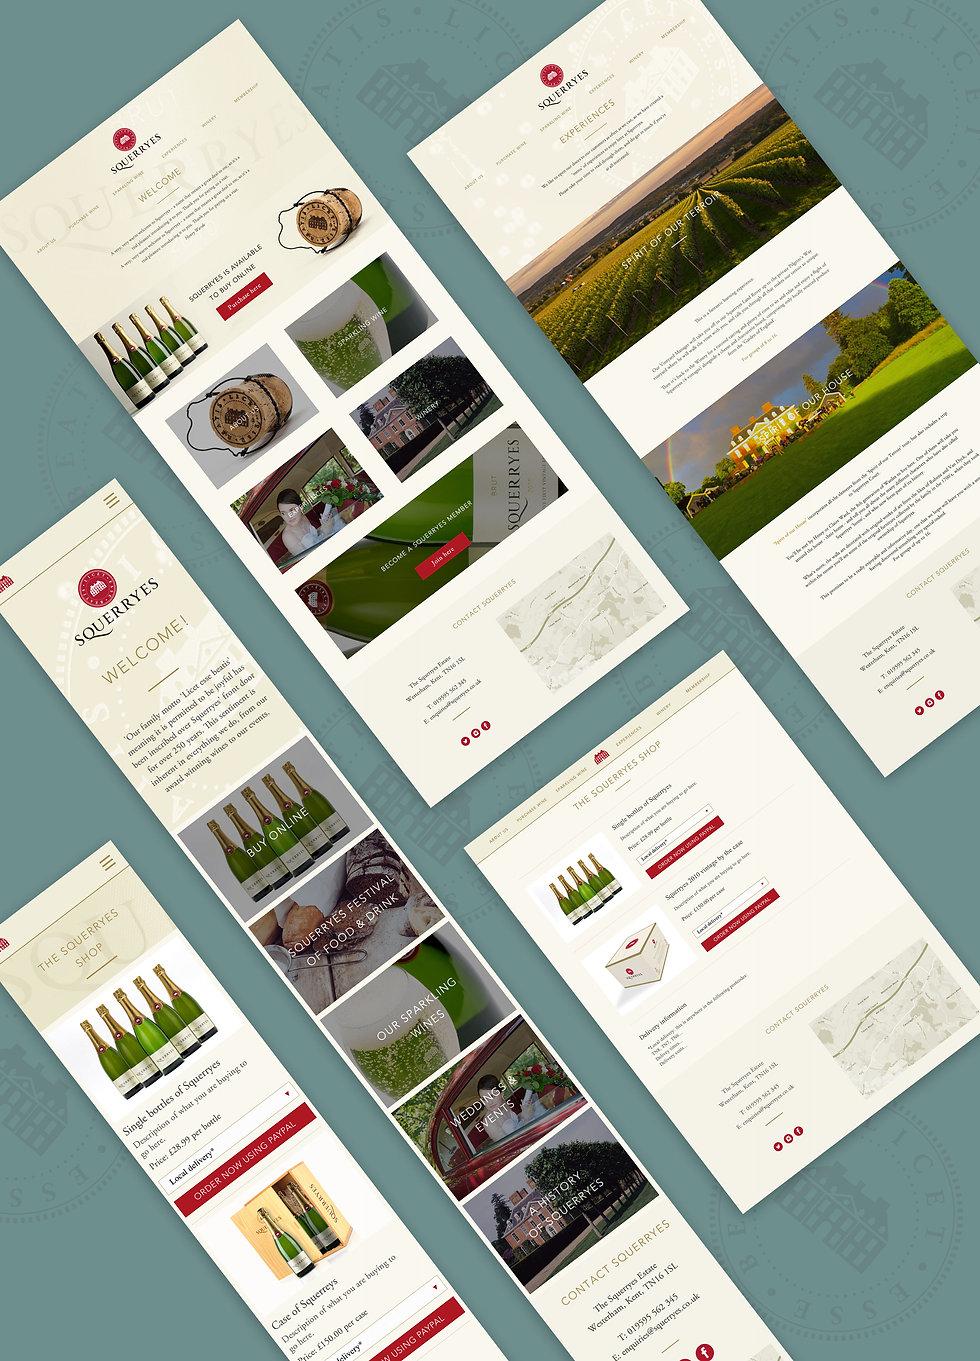 website_pages.jpg